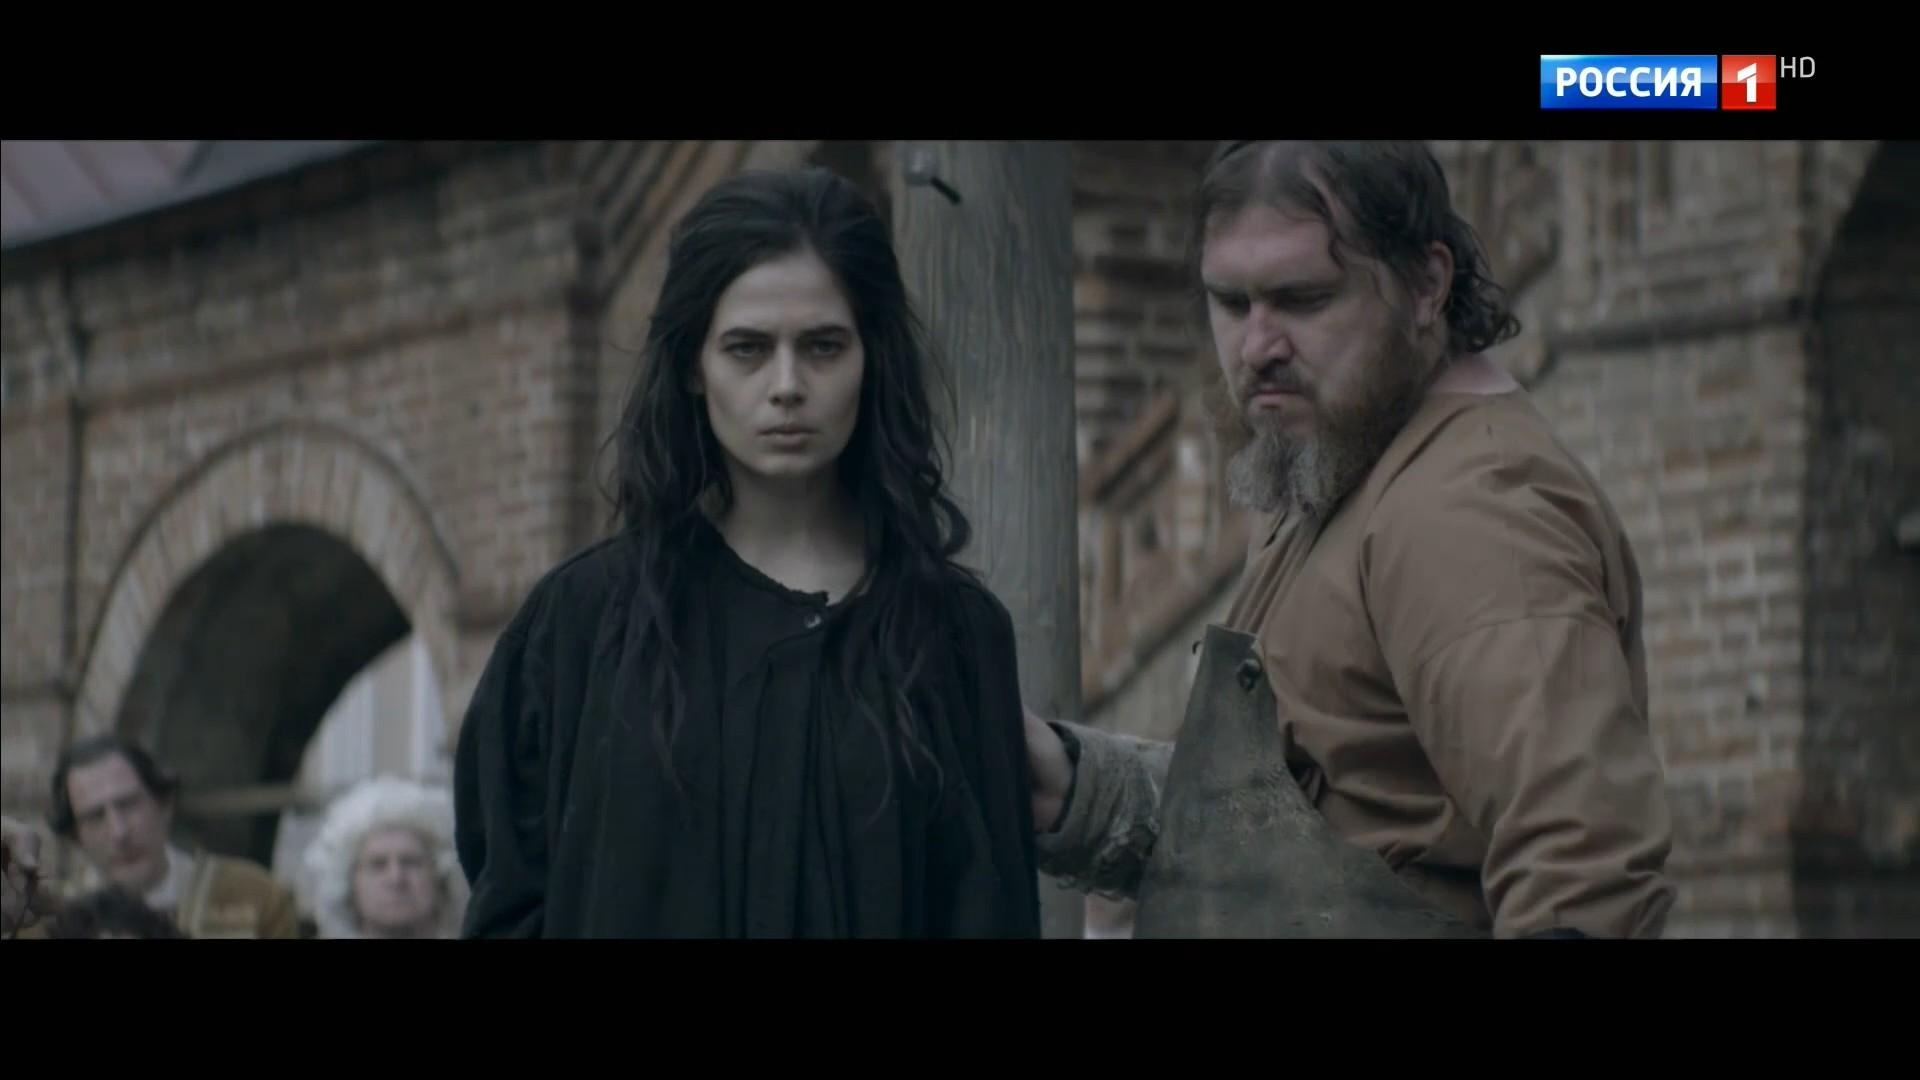 Кровавая барыня [S01] (2018) HDTV 1080p